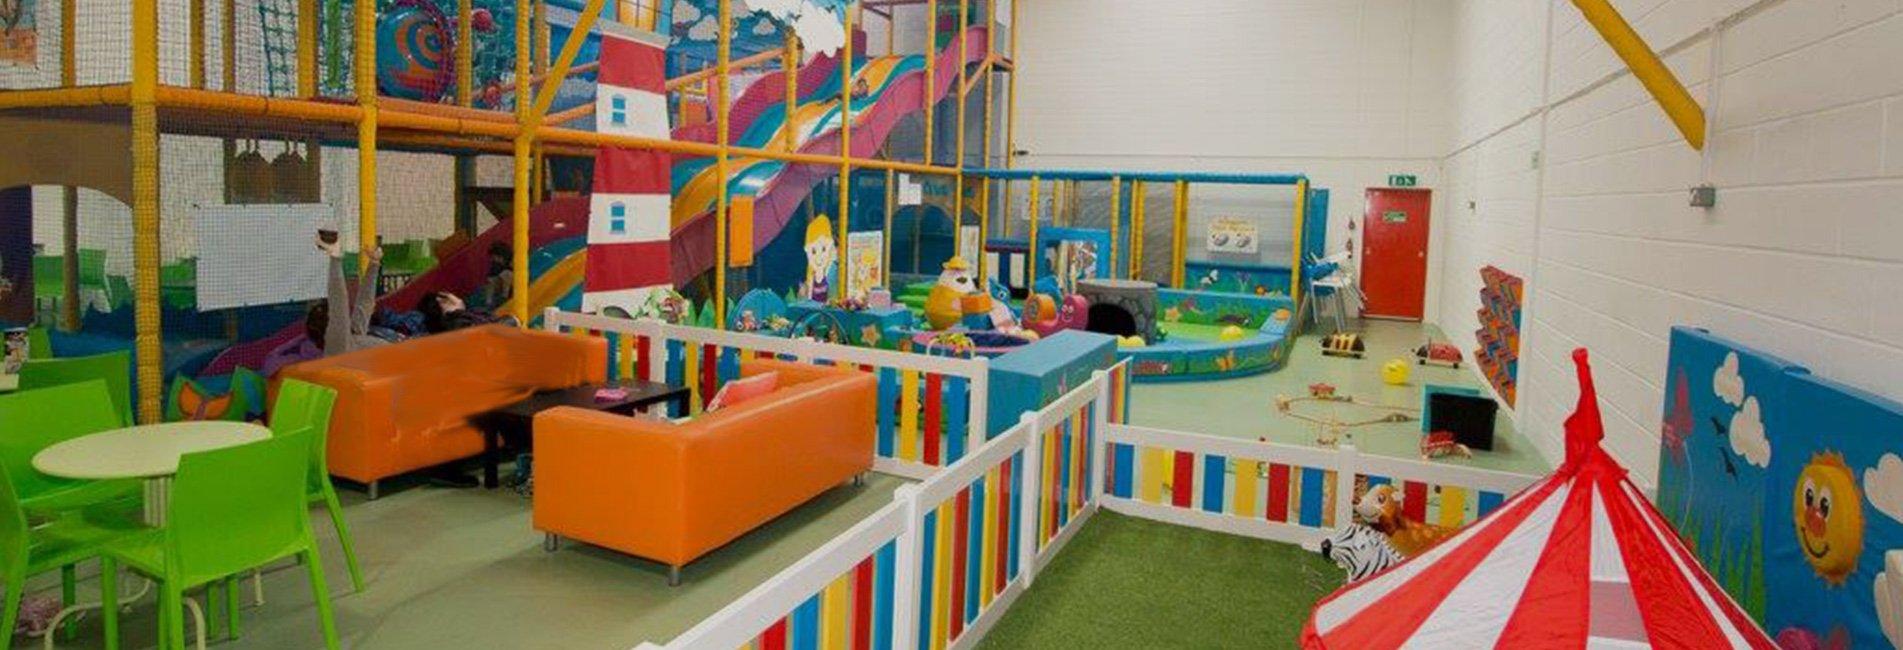 tekplas slider-play-center